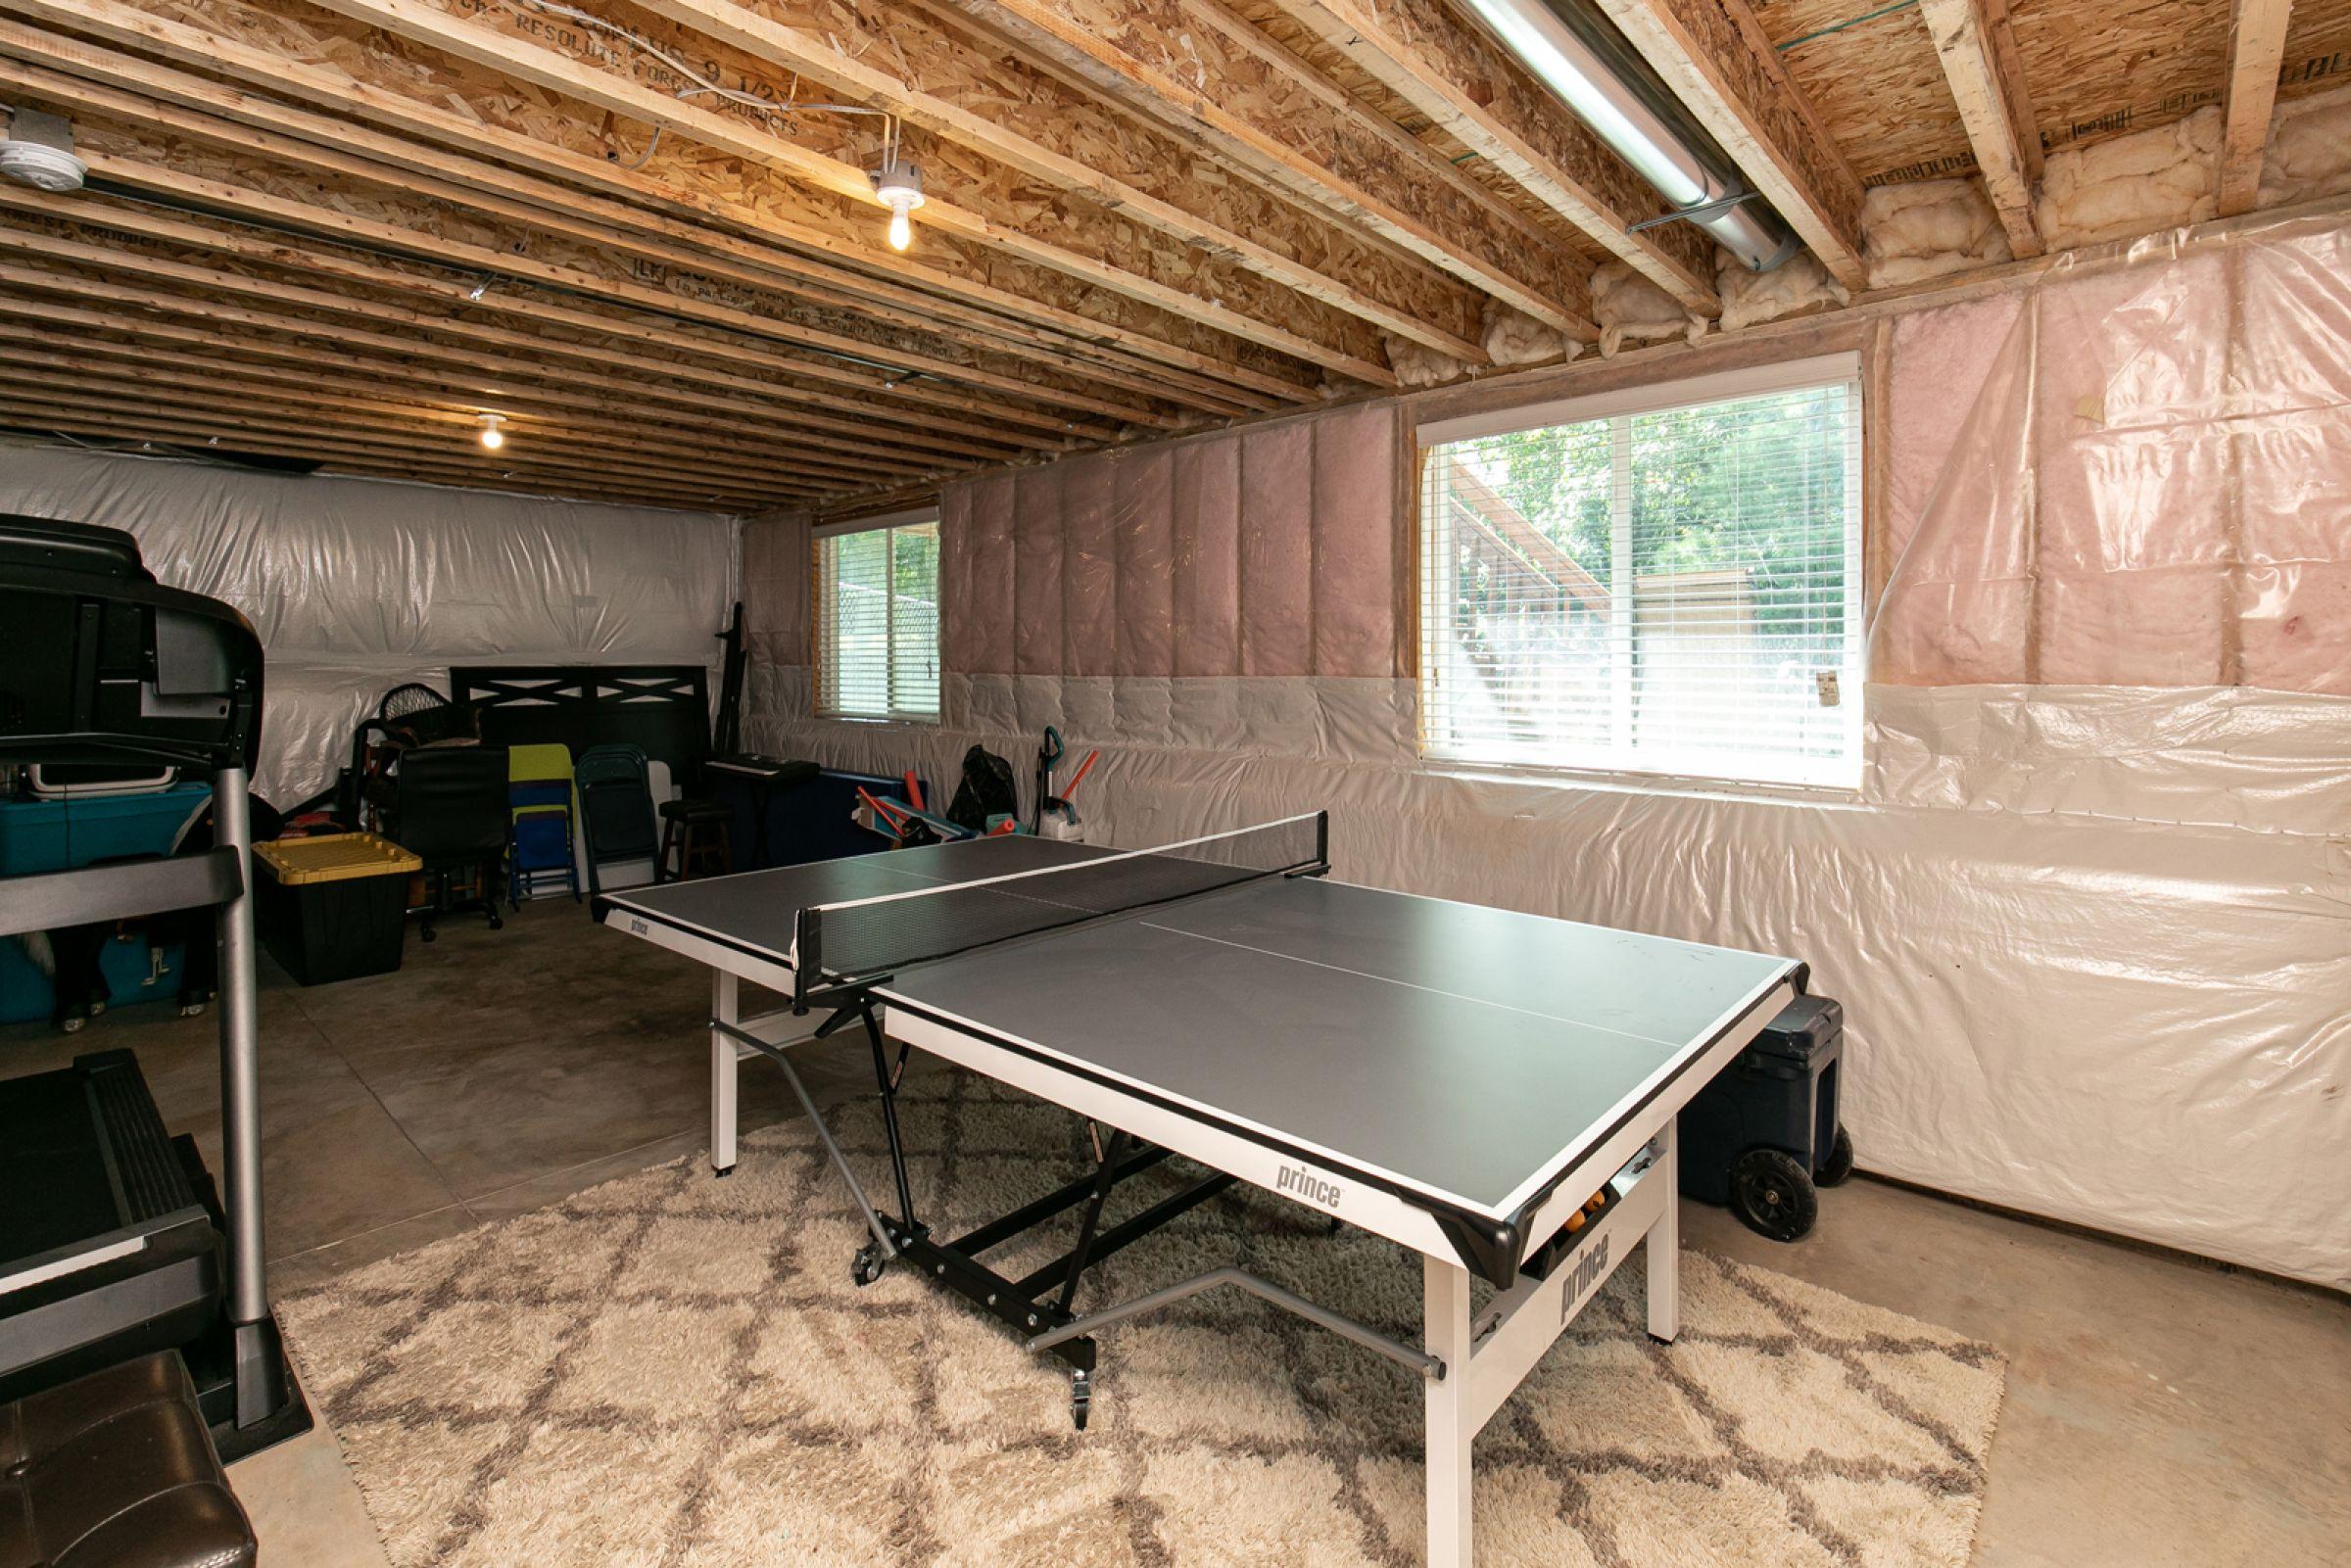 residential-warren-county-iowa-0-acres-listing-number-15685-6-2021-08-31-032509.jpg